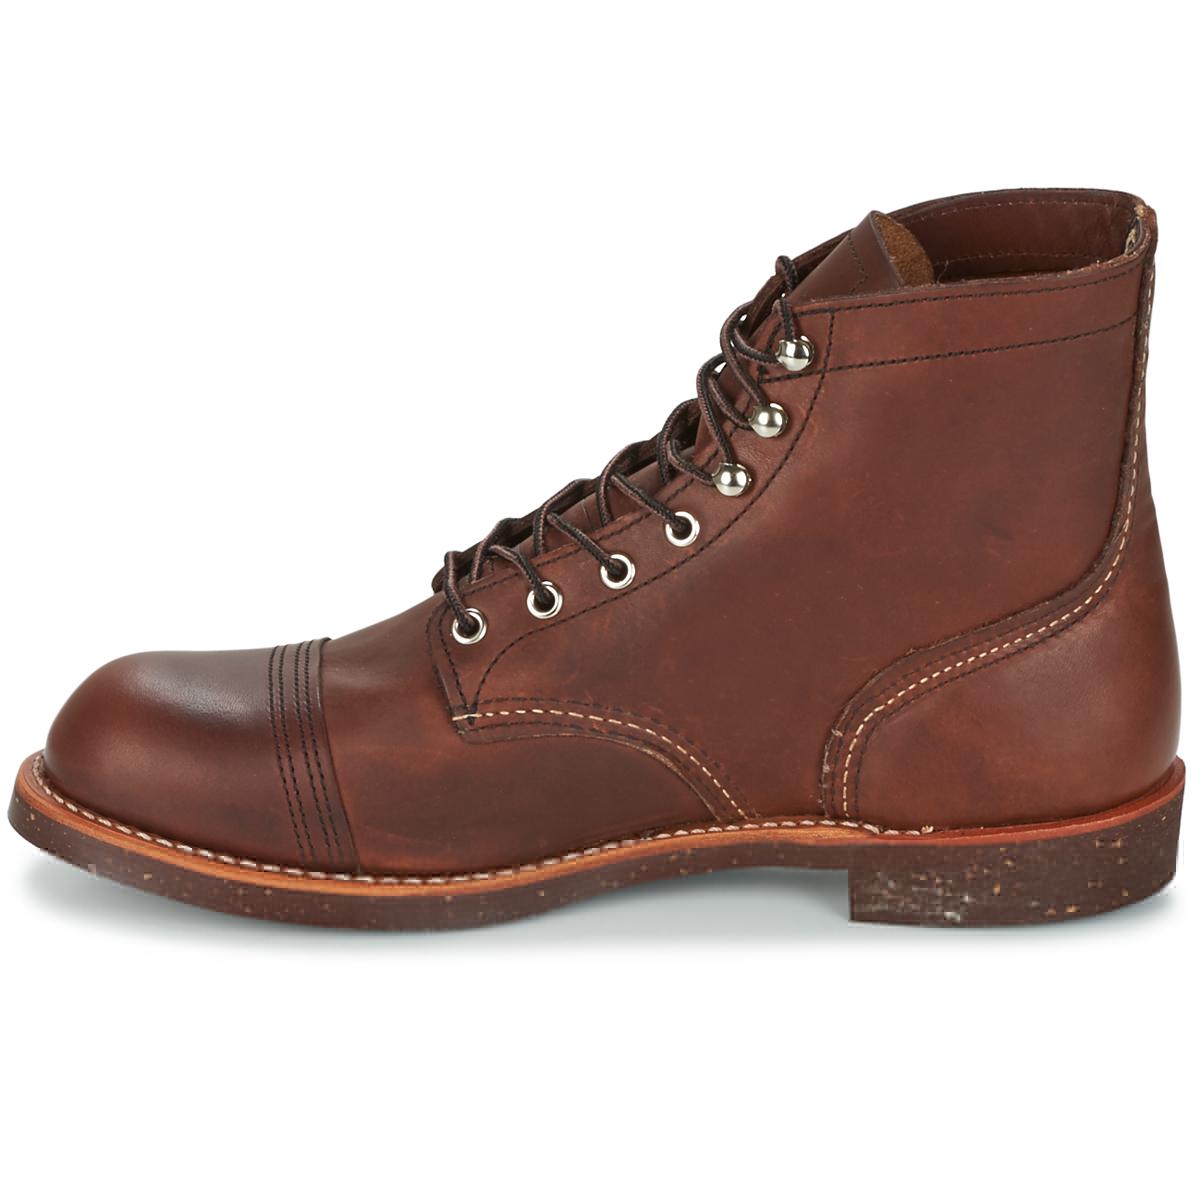 RED WING 红翼 8111-AMBER 男士短筒皮靴 棕色